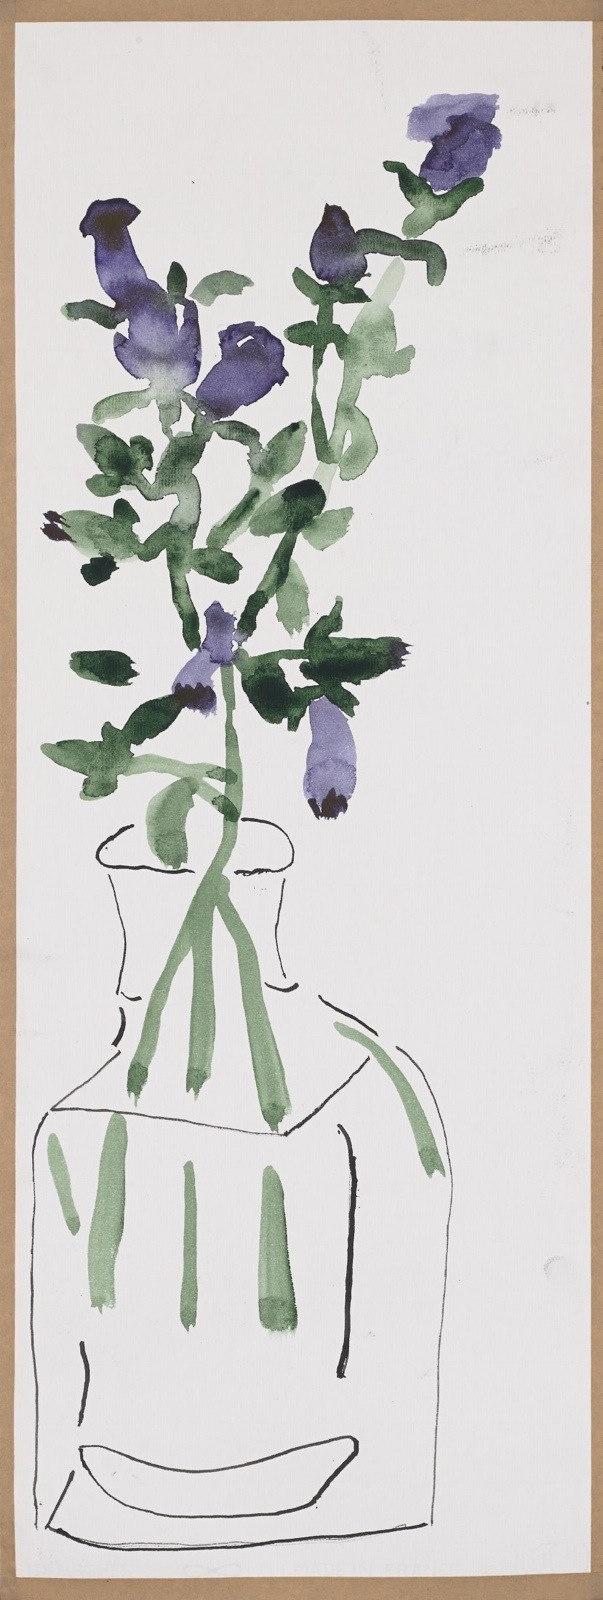 Dessin, aquarelle : Fleurs en bocal